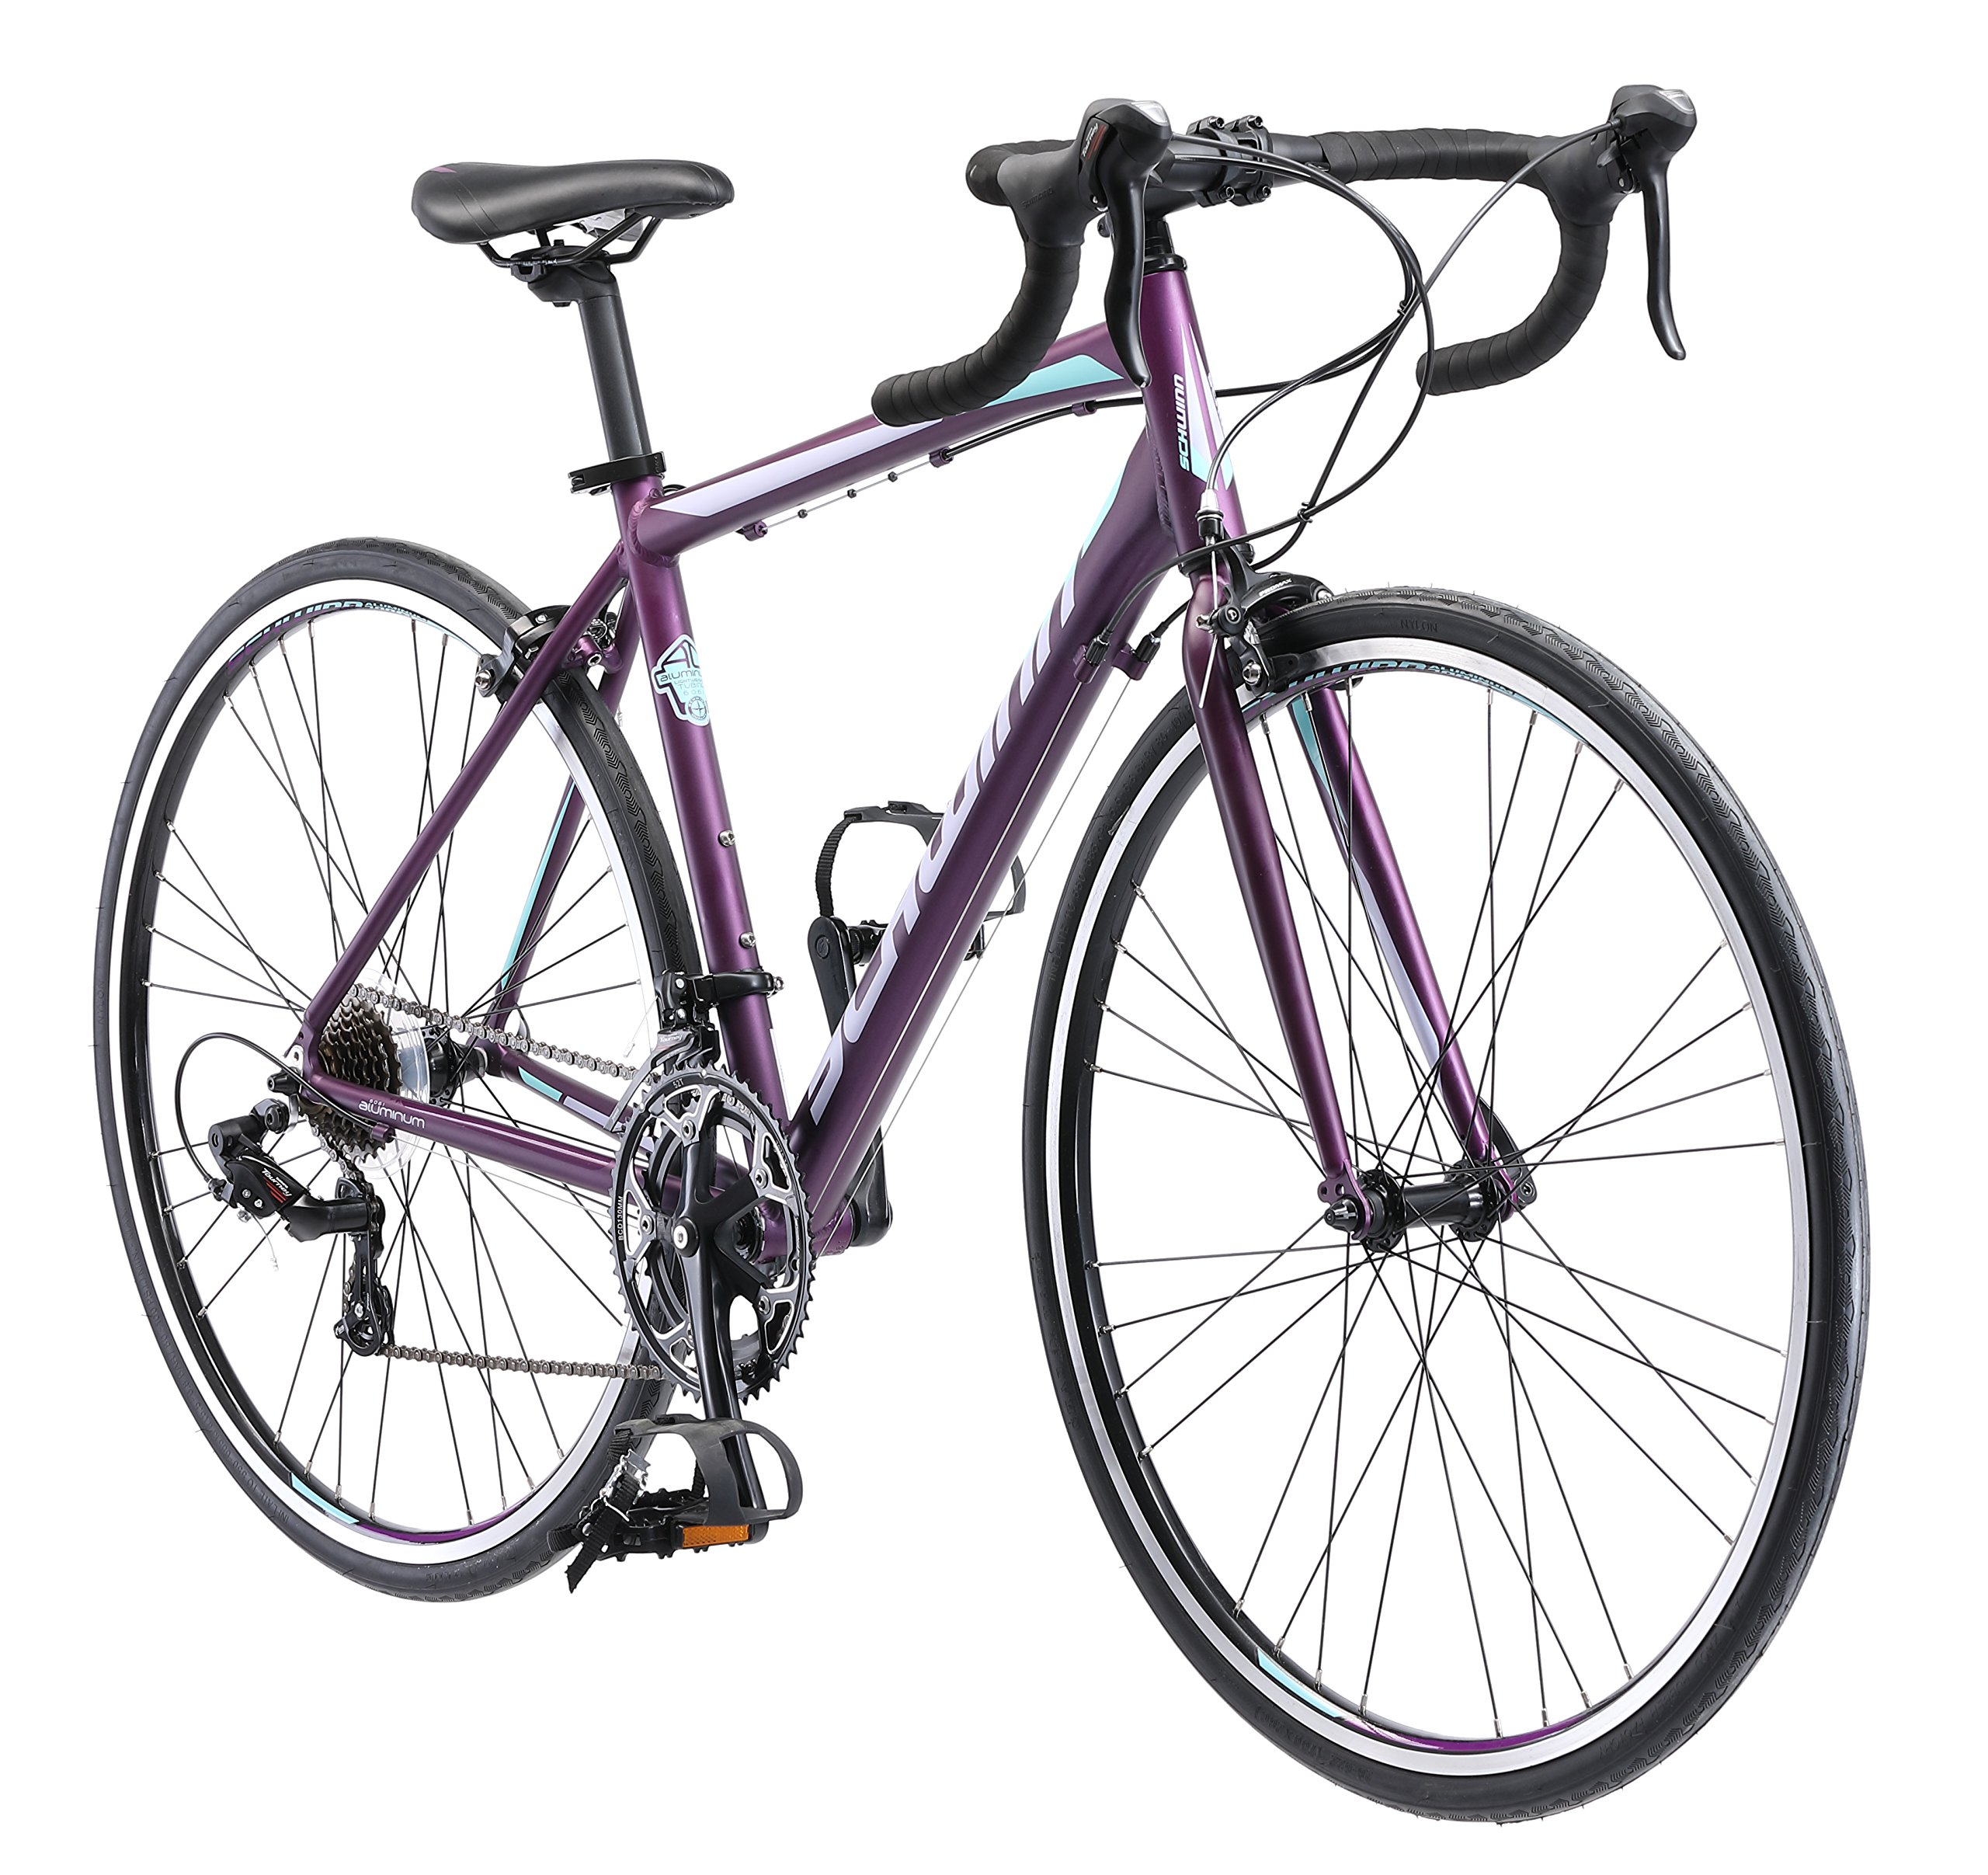 Schwinn Volare 1400 Road 700C Wheel Bicycle, Matte Purple, 48 cm/One Size by Schwinn (Image #1)